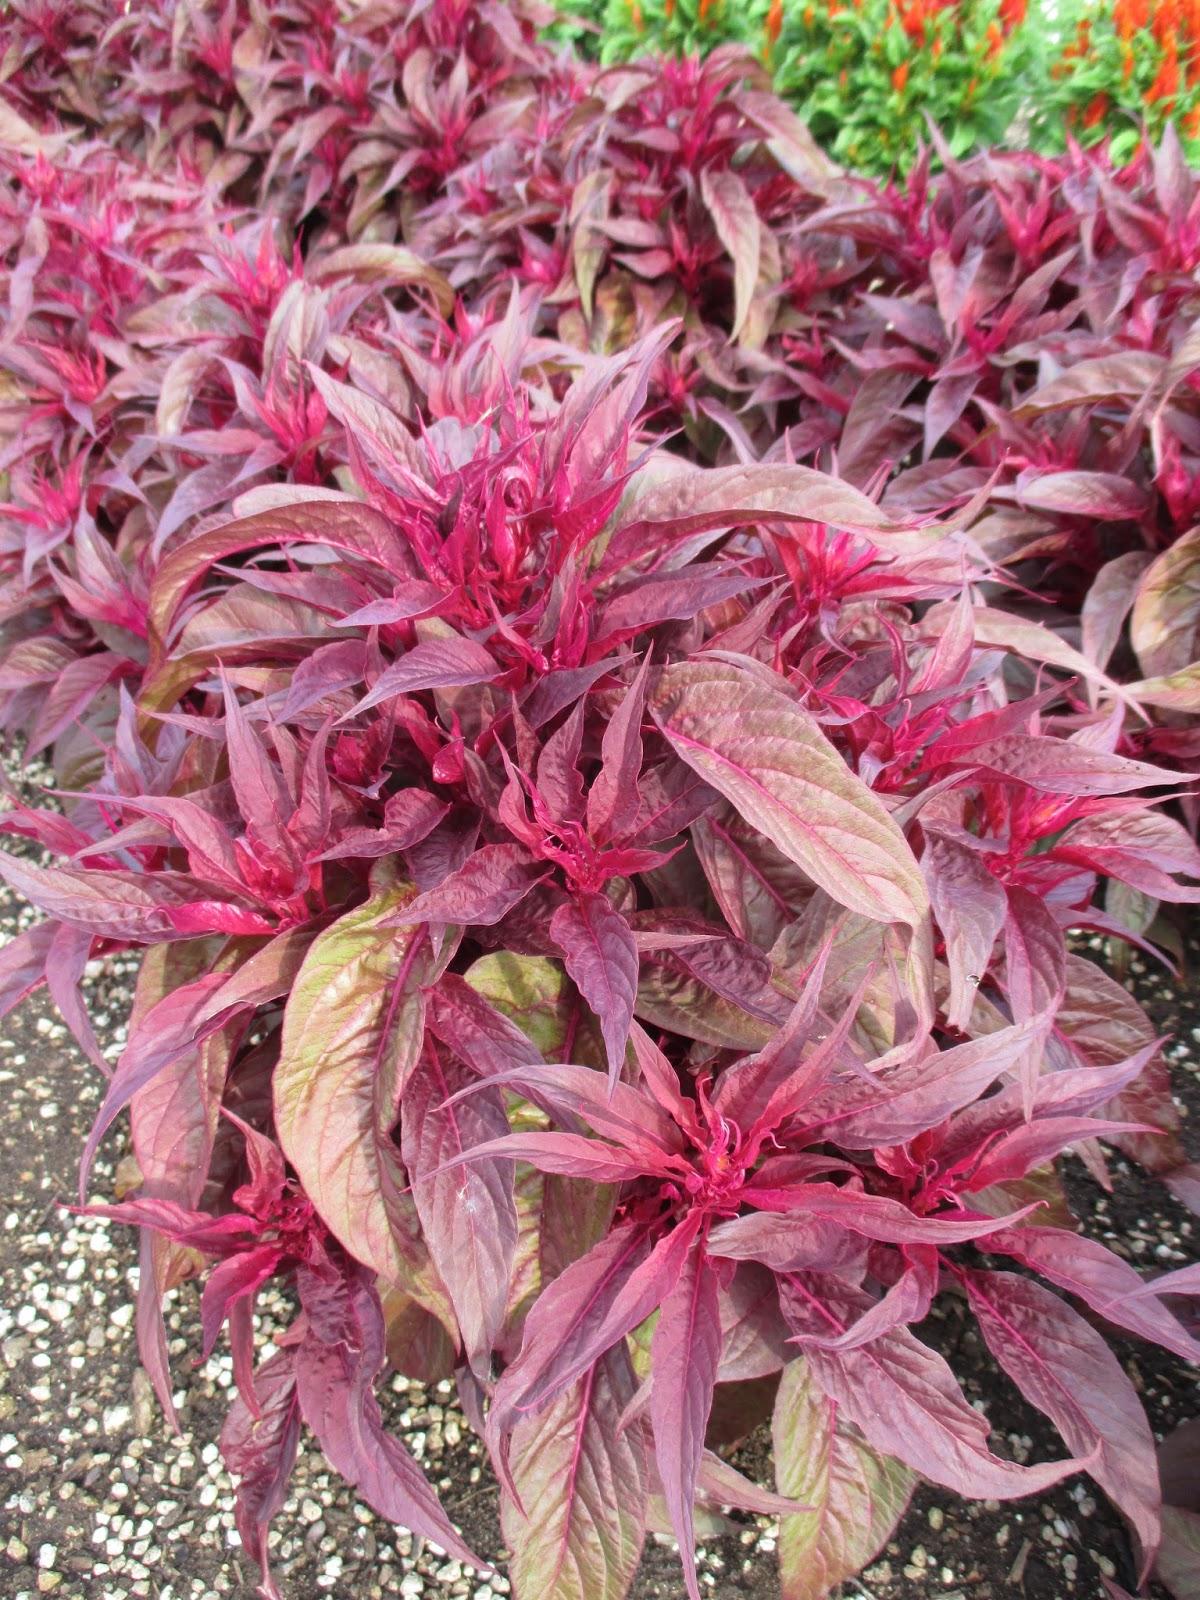 Dragons Breath Celosia Rotary Botanical Gardens